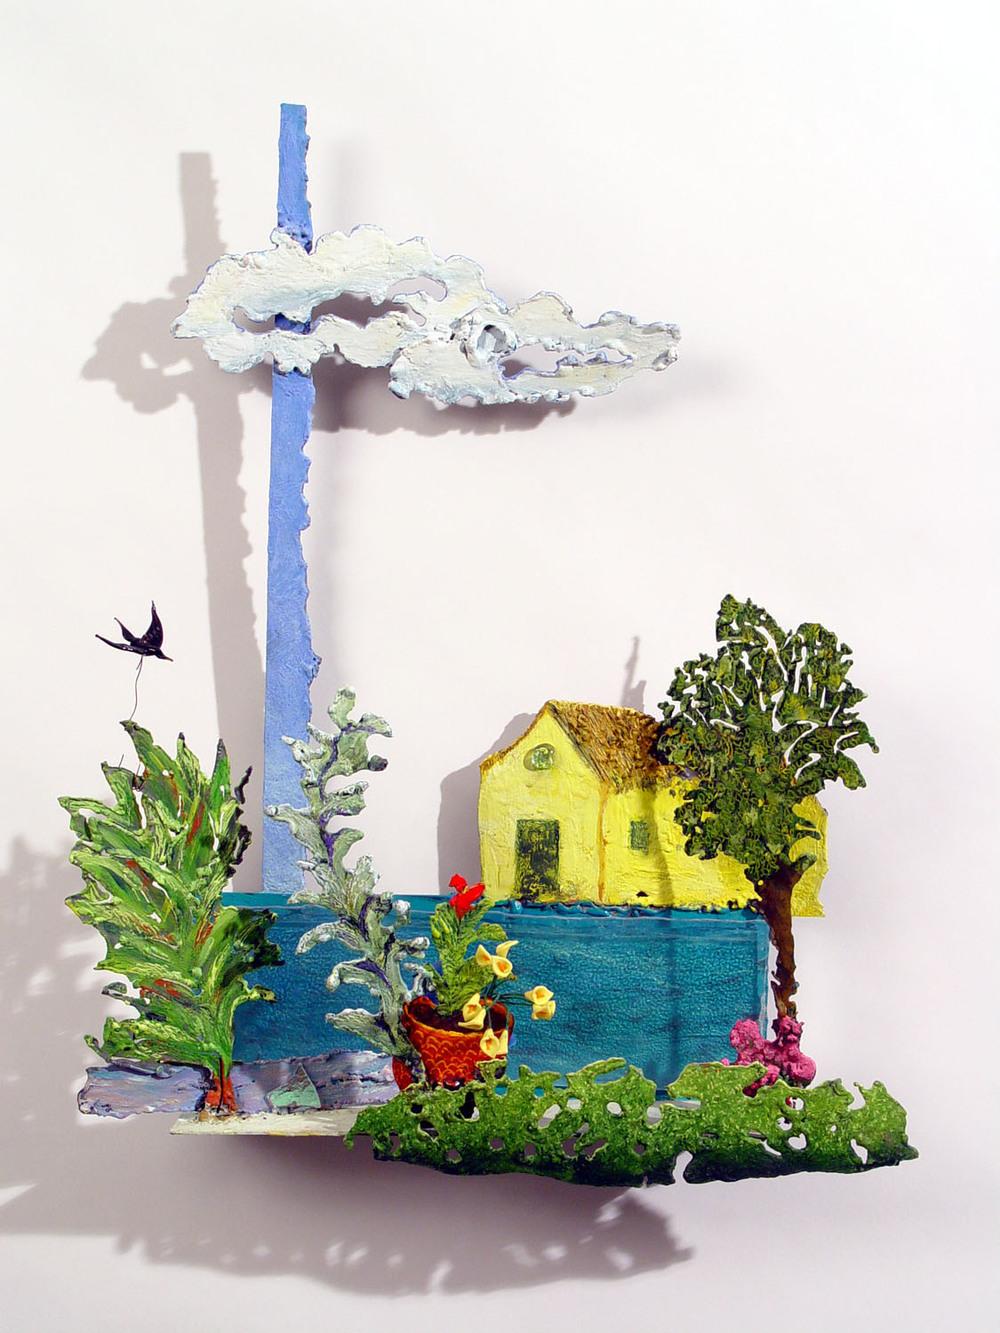 "MY YELLOW HOUSE, 2004, encaustic on metal, glass bird, 20 x 15 x 4"""